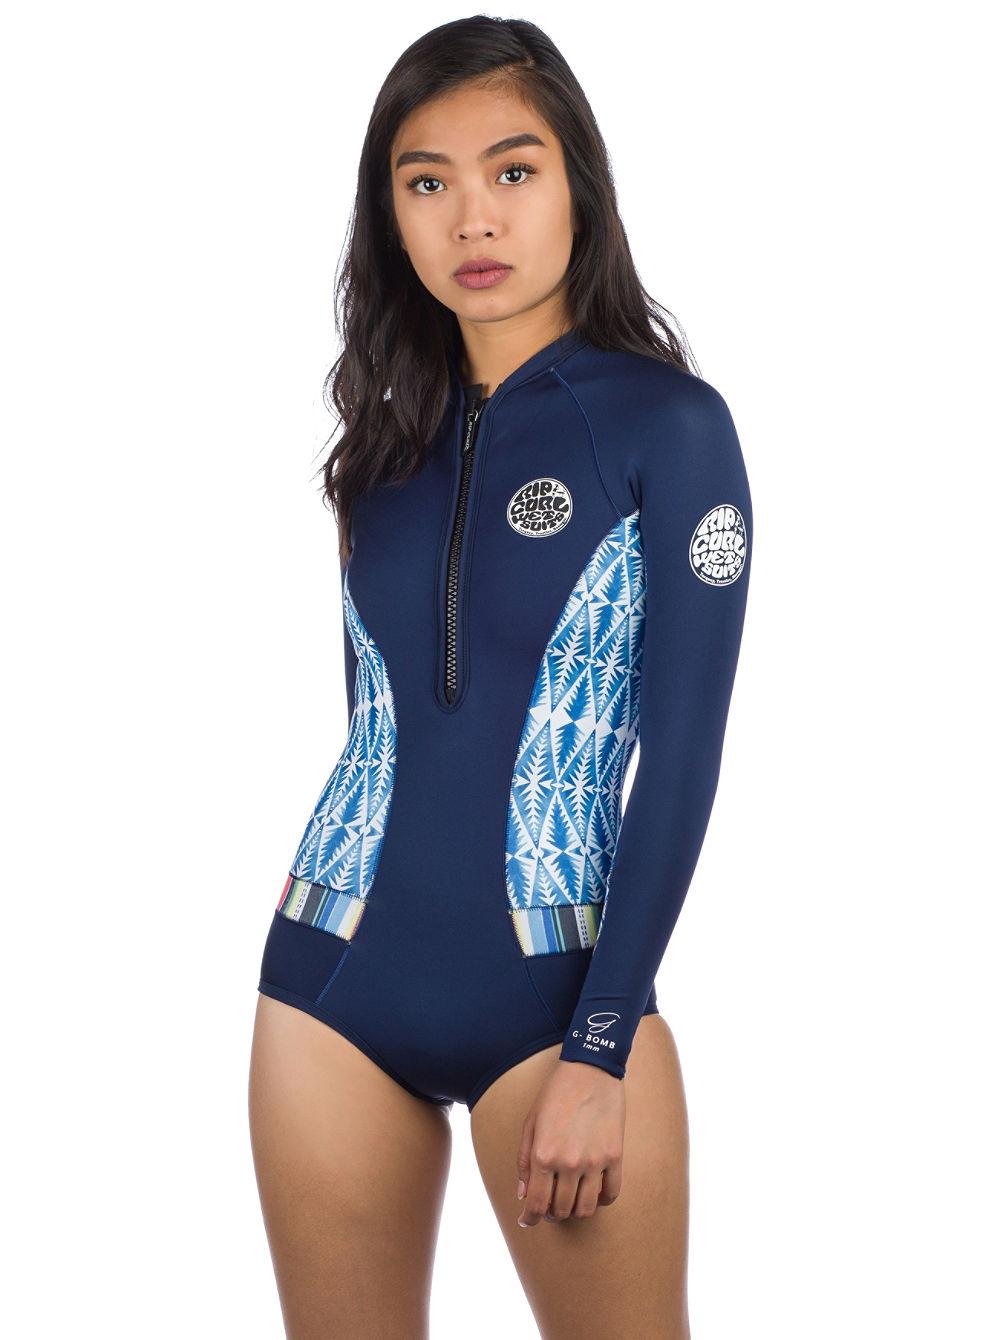 f704a1049d Buy Rip Curl G Bomb L Sl Spring Hi Cut Wetsuit online at blue-tomato.com